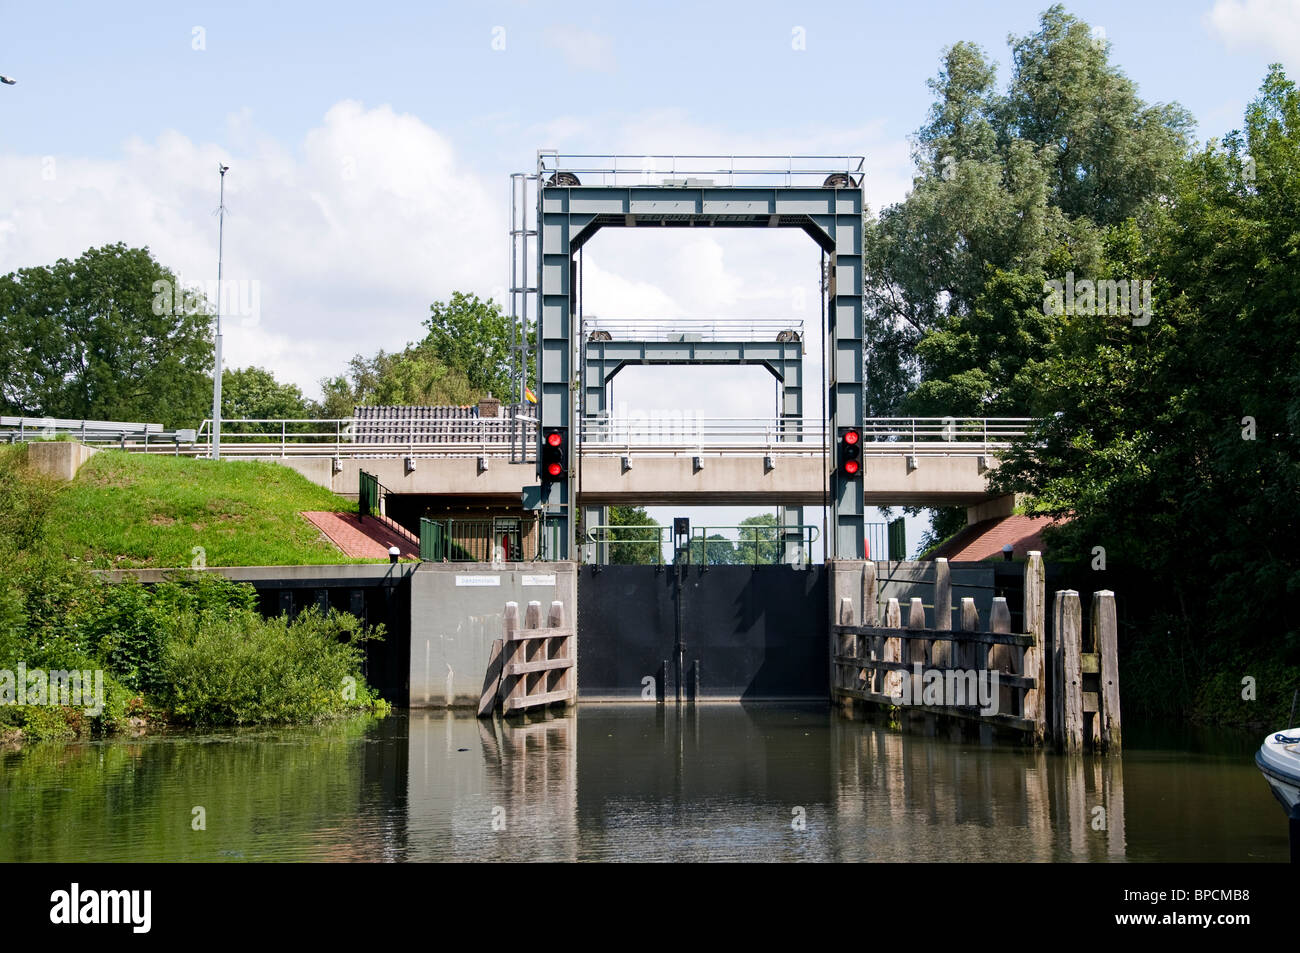 Lock Kampen Overijssel port harbor Boat Netherlands - Stock Image